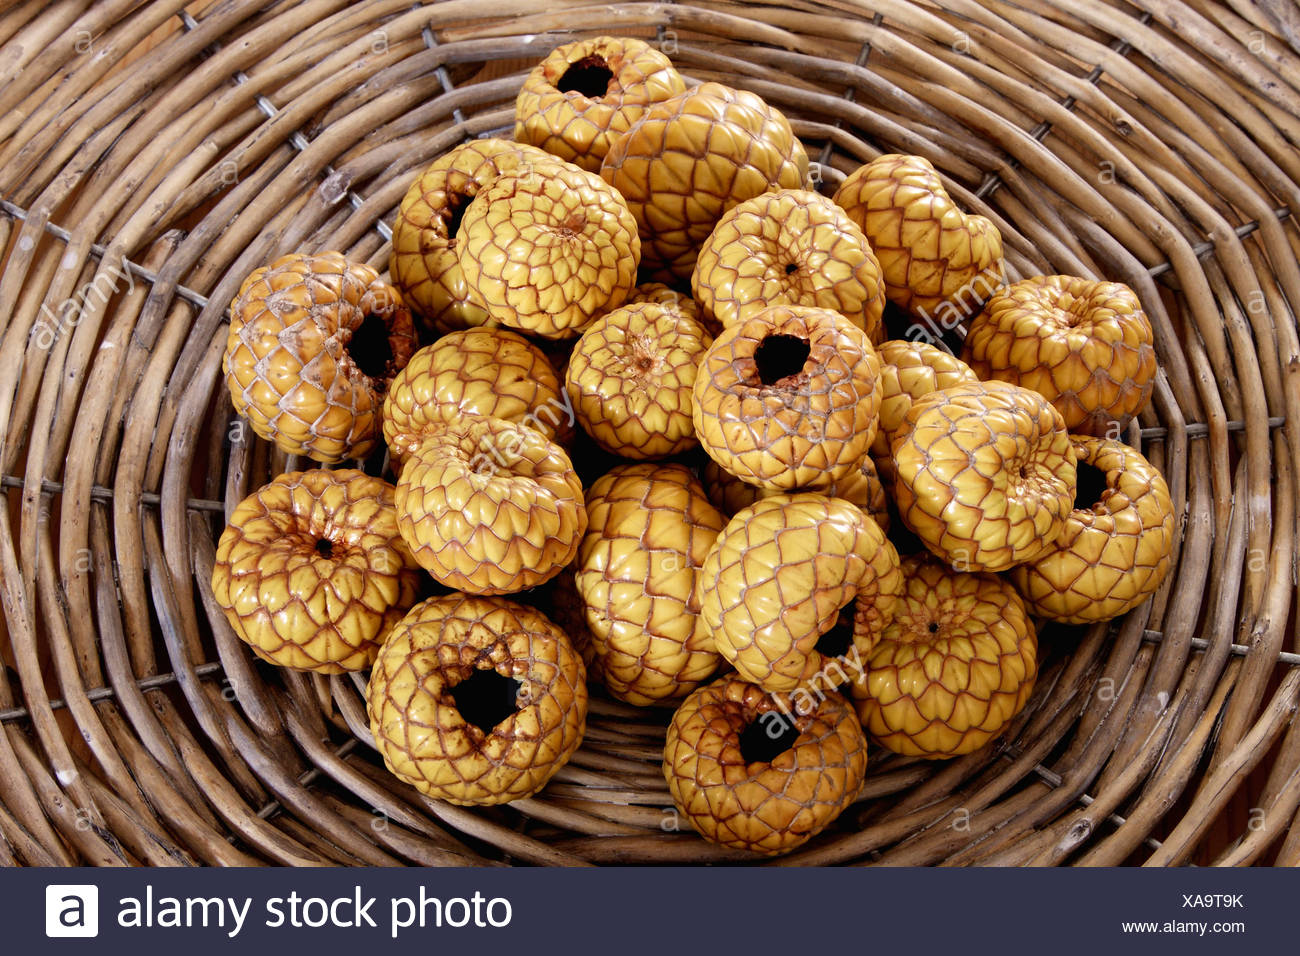 Rumbia, dried Salak fruit (Salacca zalacca) in a woven basket - Stock Image